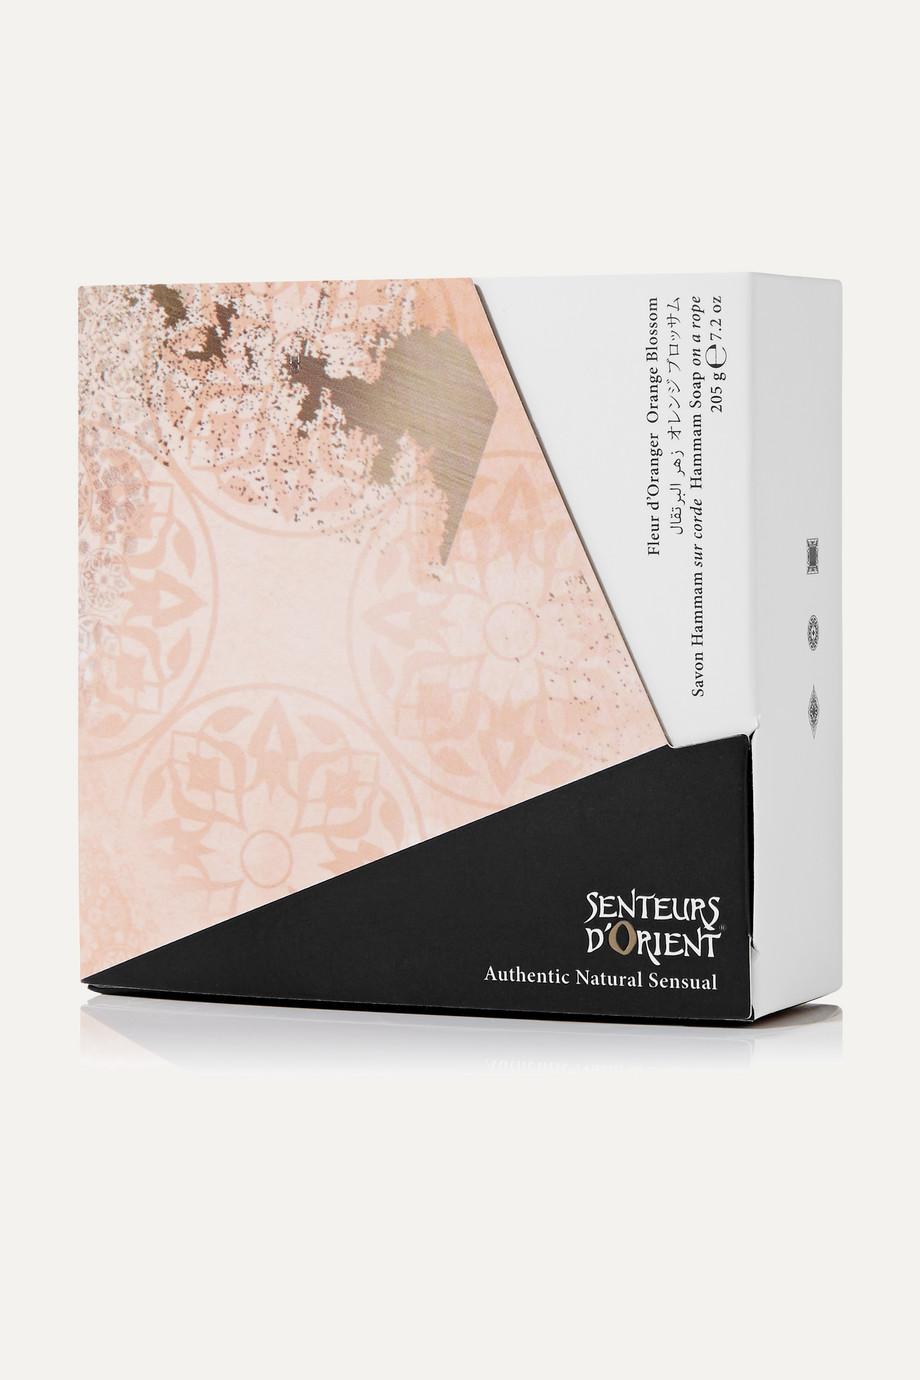 Senteurs d'Orient + NET SUSTAIN Hammam Soap - Orange Blossom, 205g